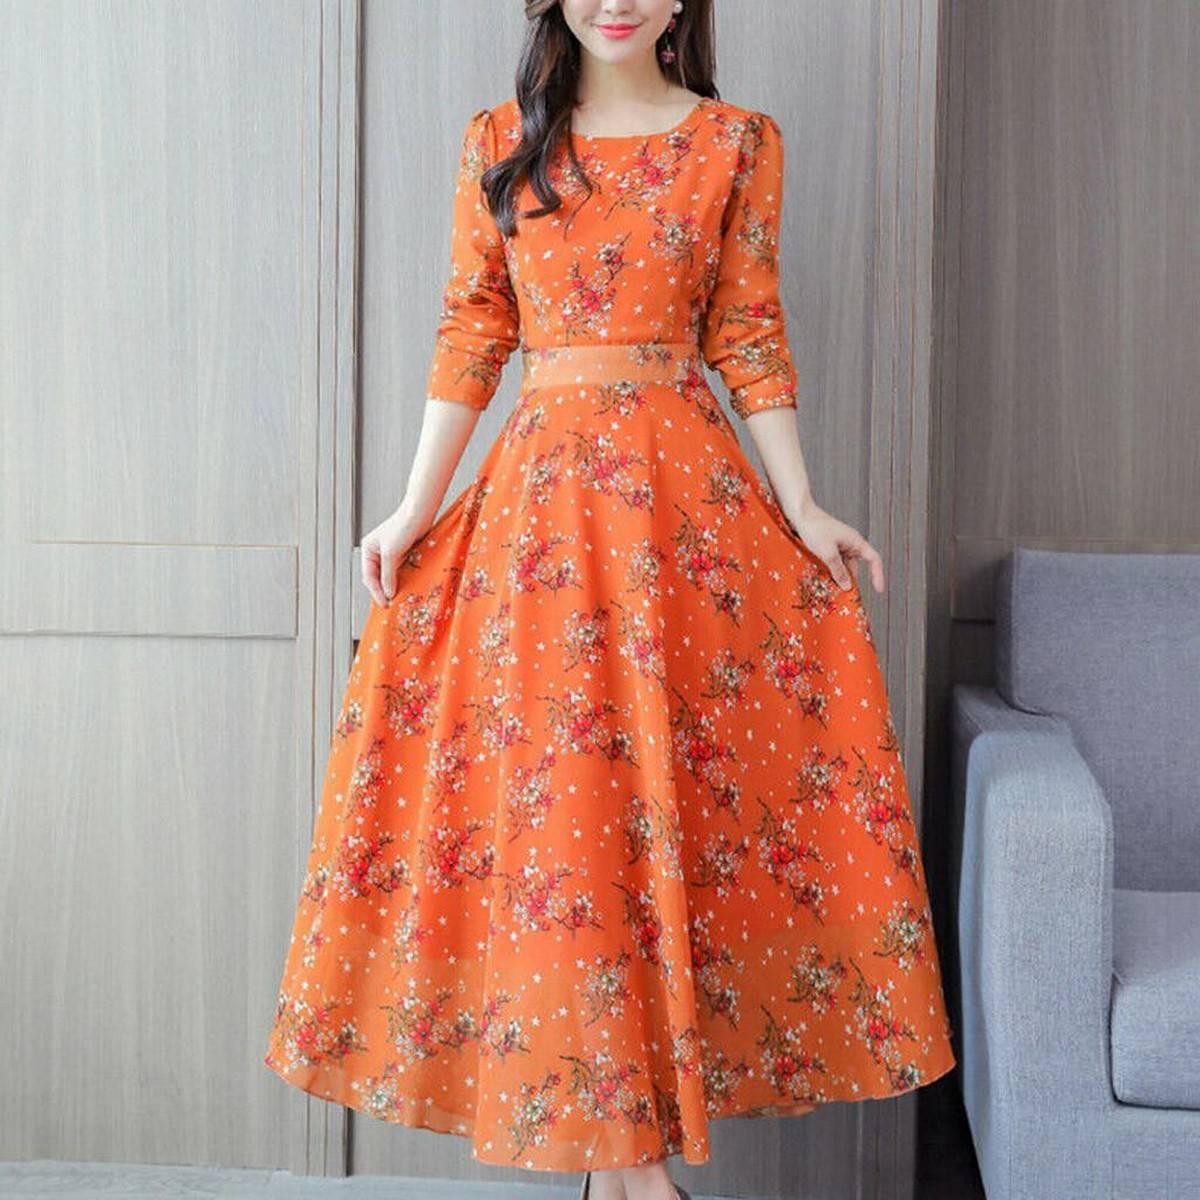 Women Floral Beach Dress Long Sleeve Casual Party Vintage Boho Maxi Dress Comfortable Versatile Dress